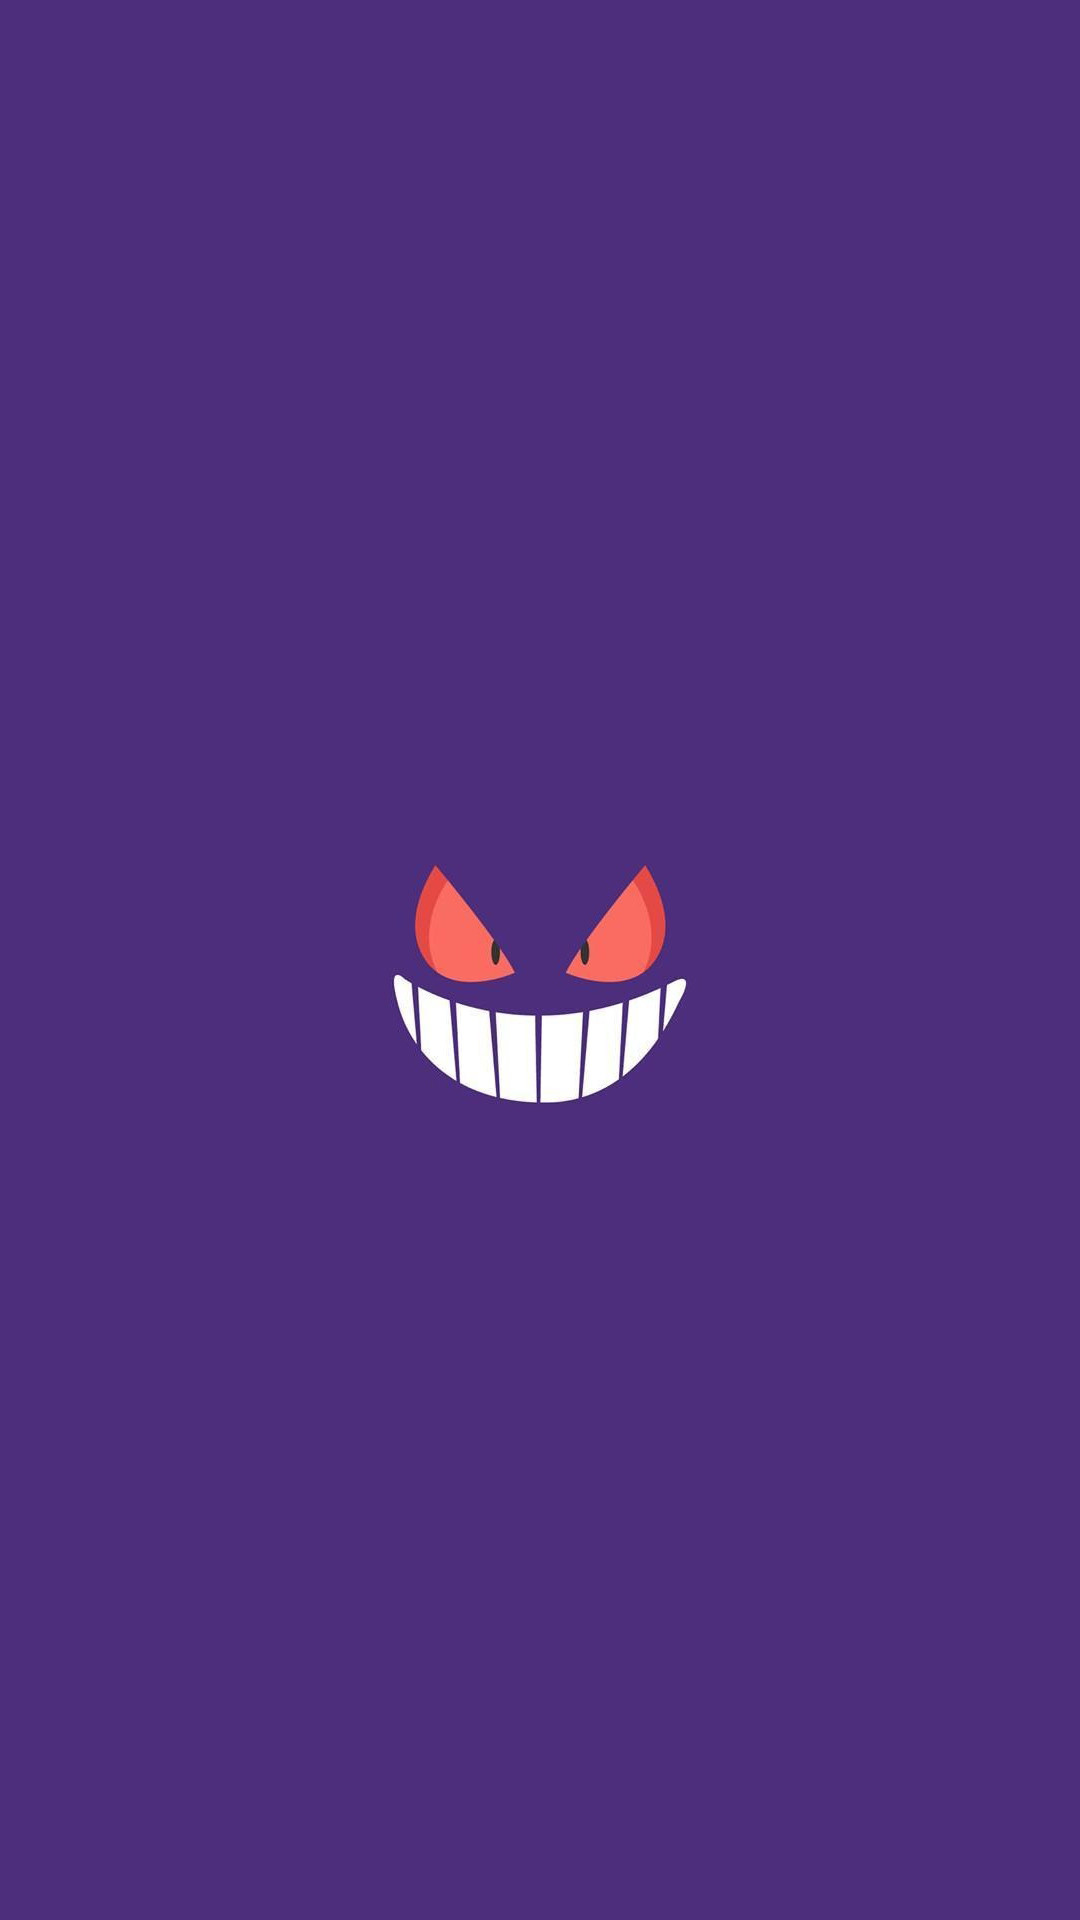 Gengar Pokemon Character iPhone 6+ HD Wallpaper …